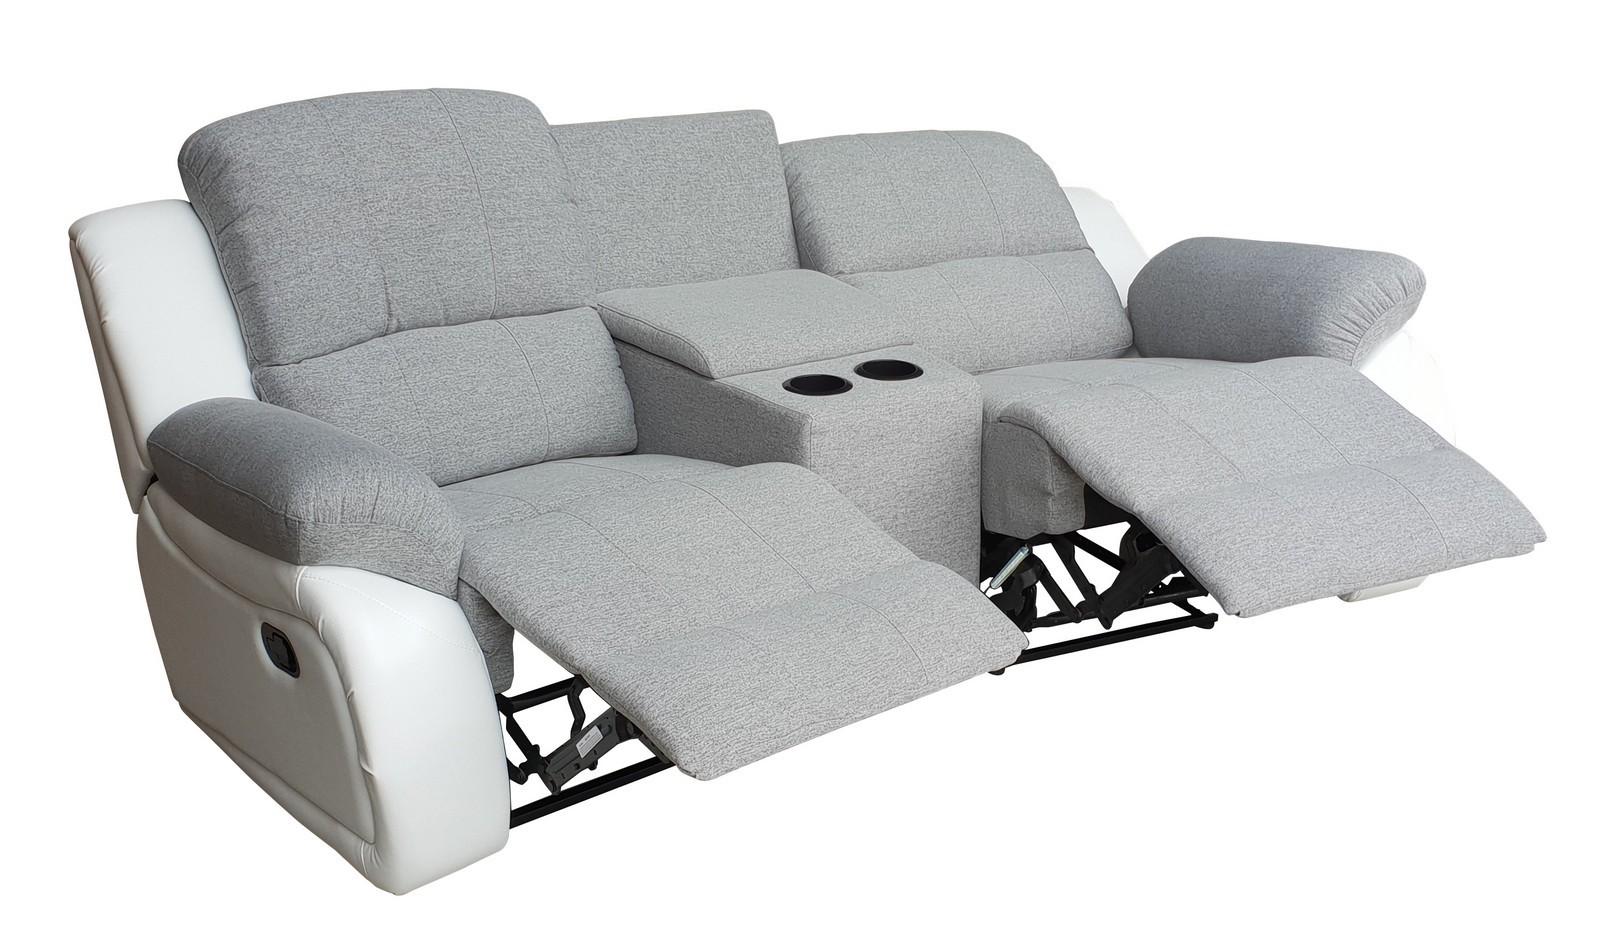 Full Size of Heimkino Sofa Himolla 3 Sitzer Elektrischer Relaxfunktion Relaxsofa Fernsehsofa Recliner Musterring Couch Elektrisch Test Xora Kaufen Heimkino Sofa Lederlook Sofa Heimkino Sofa